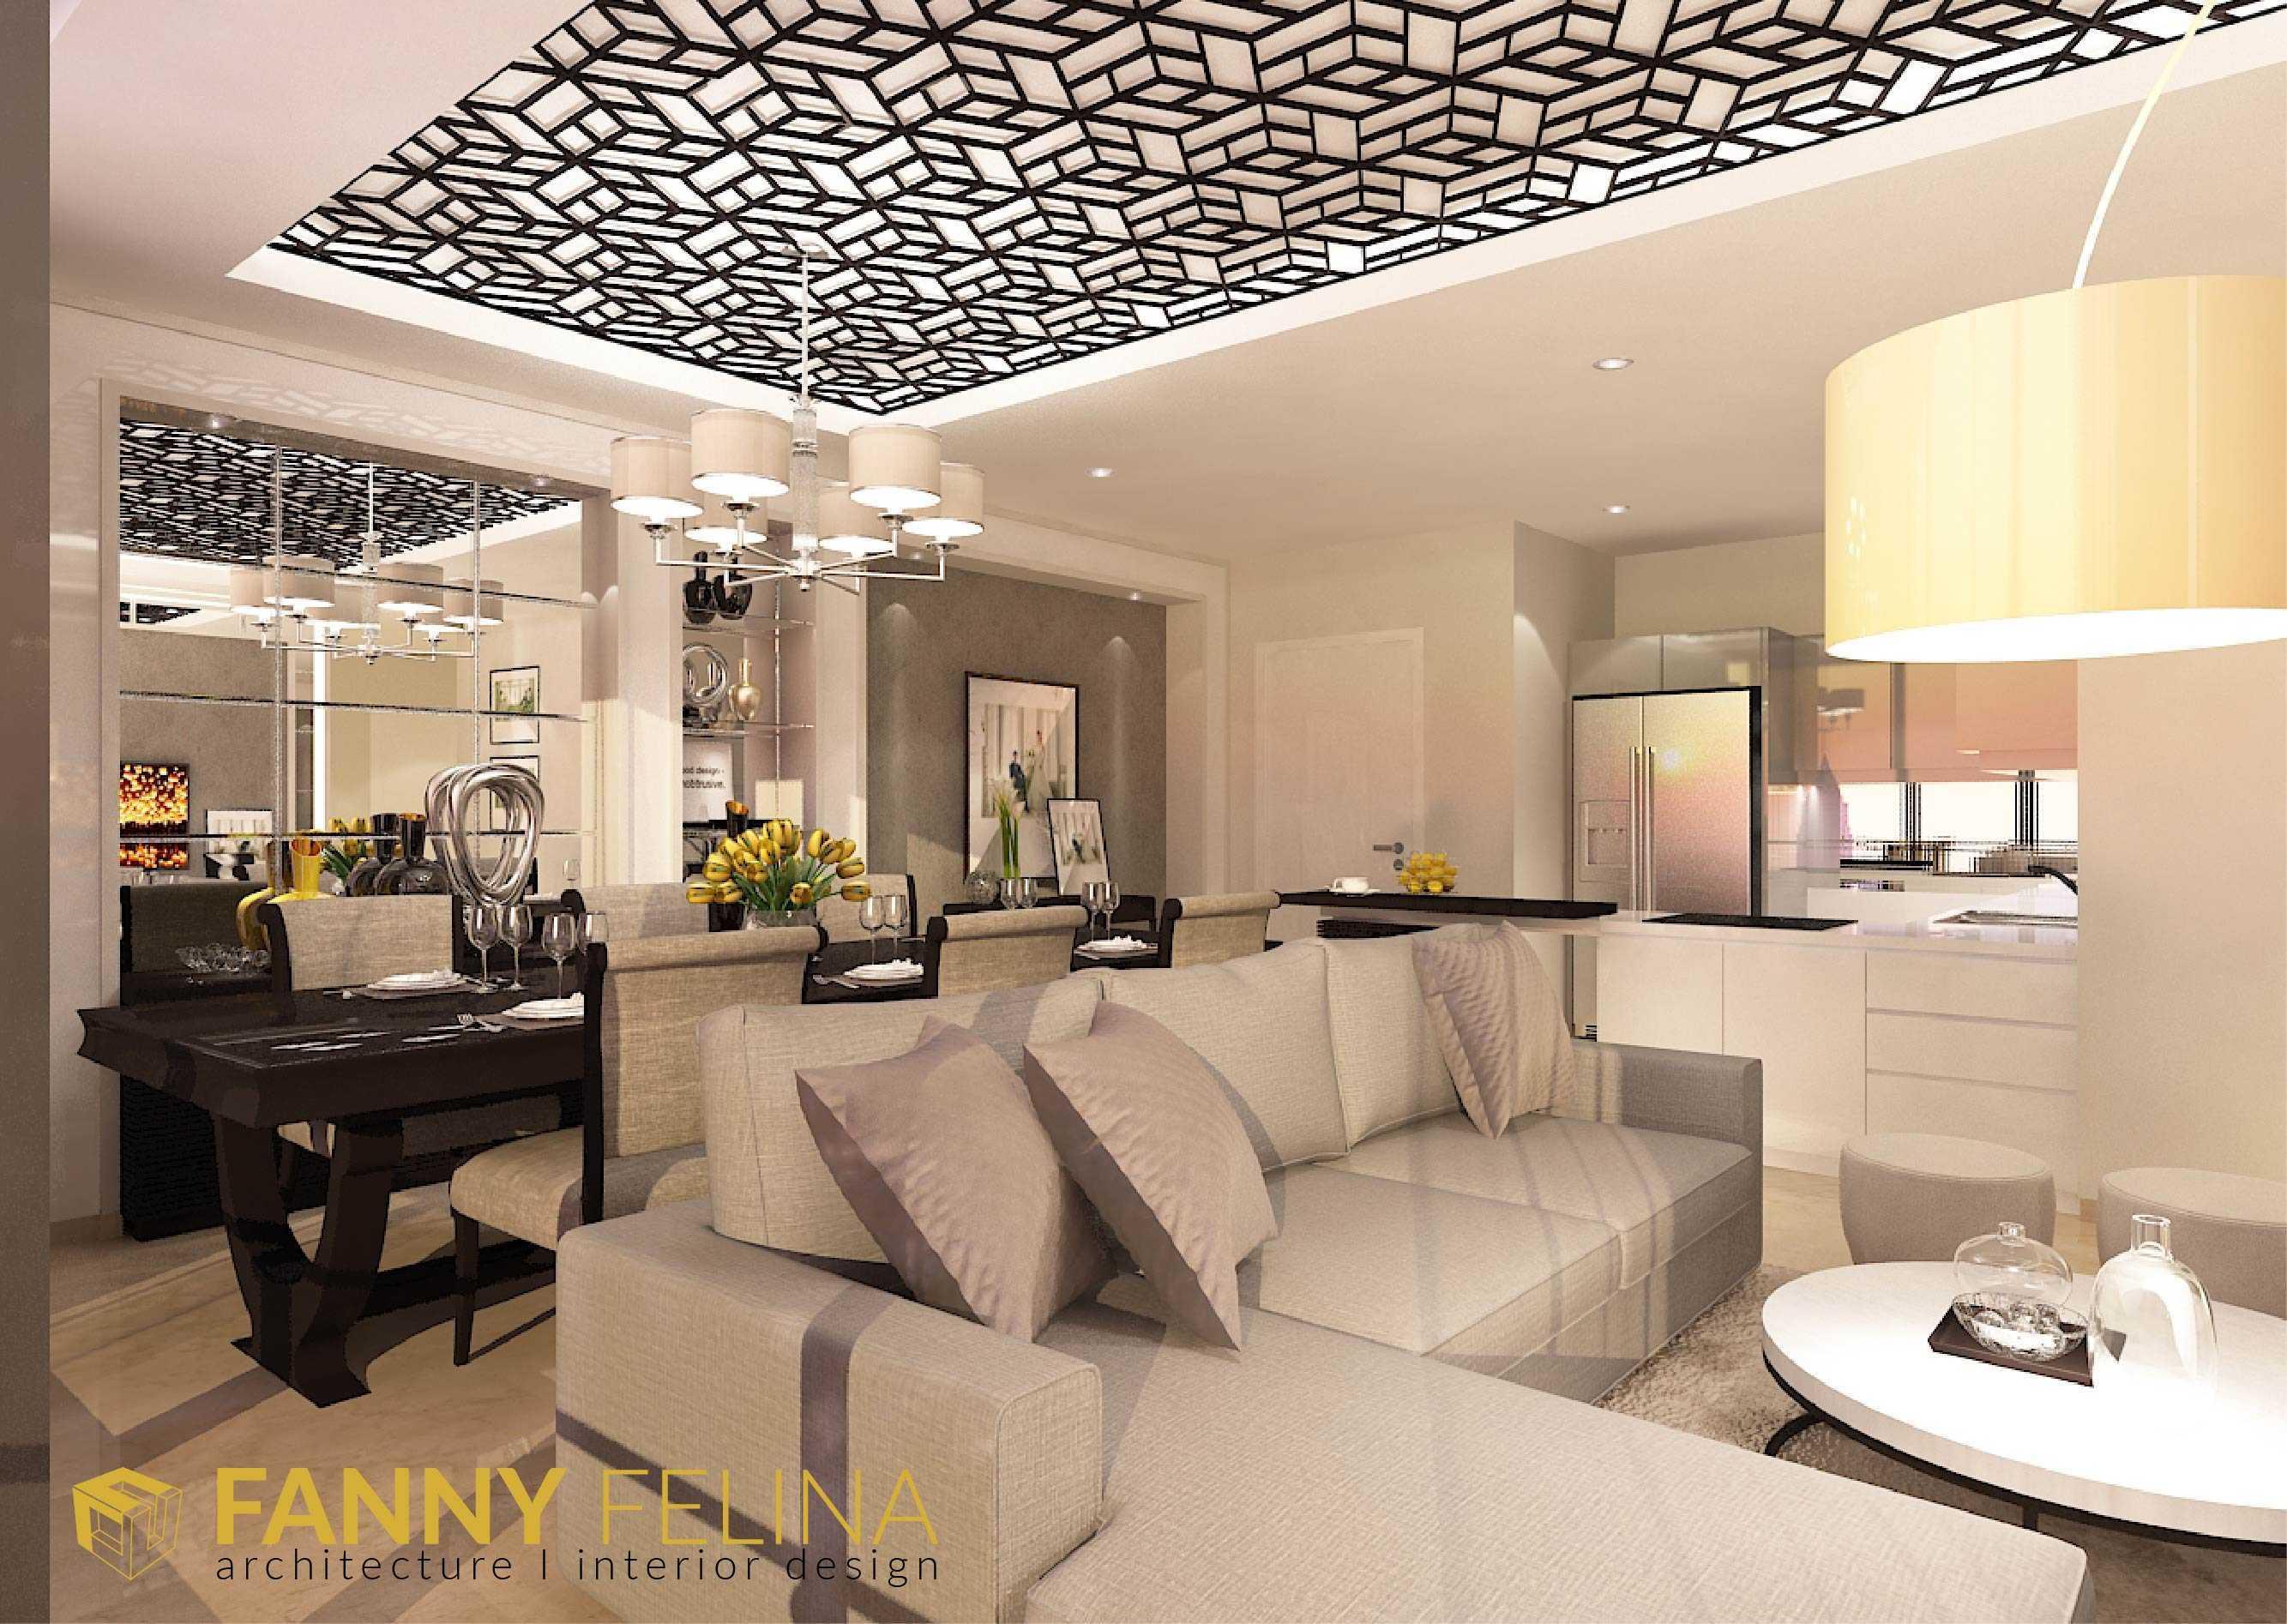 Fanny Felina Architecture & Interior Design Voila Apartment Surabaya, Surabaya City, East Java, Indonesia Surabaya, Surabaya City, East Java, Indonesia Voila-02 Kontemporer  41193